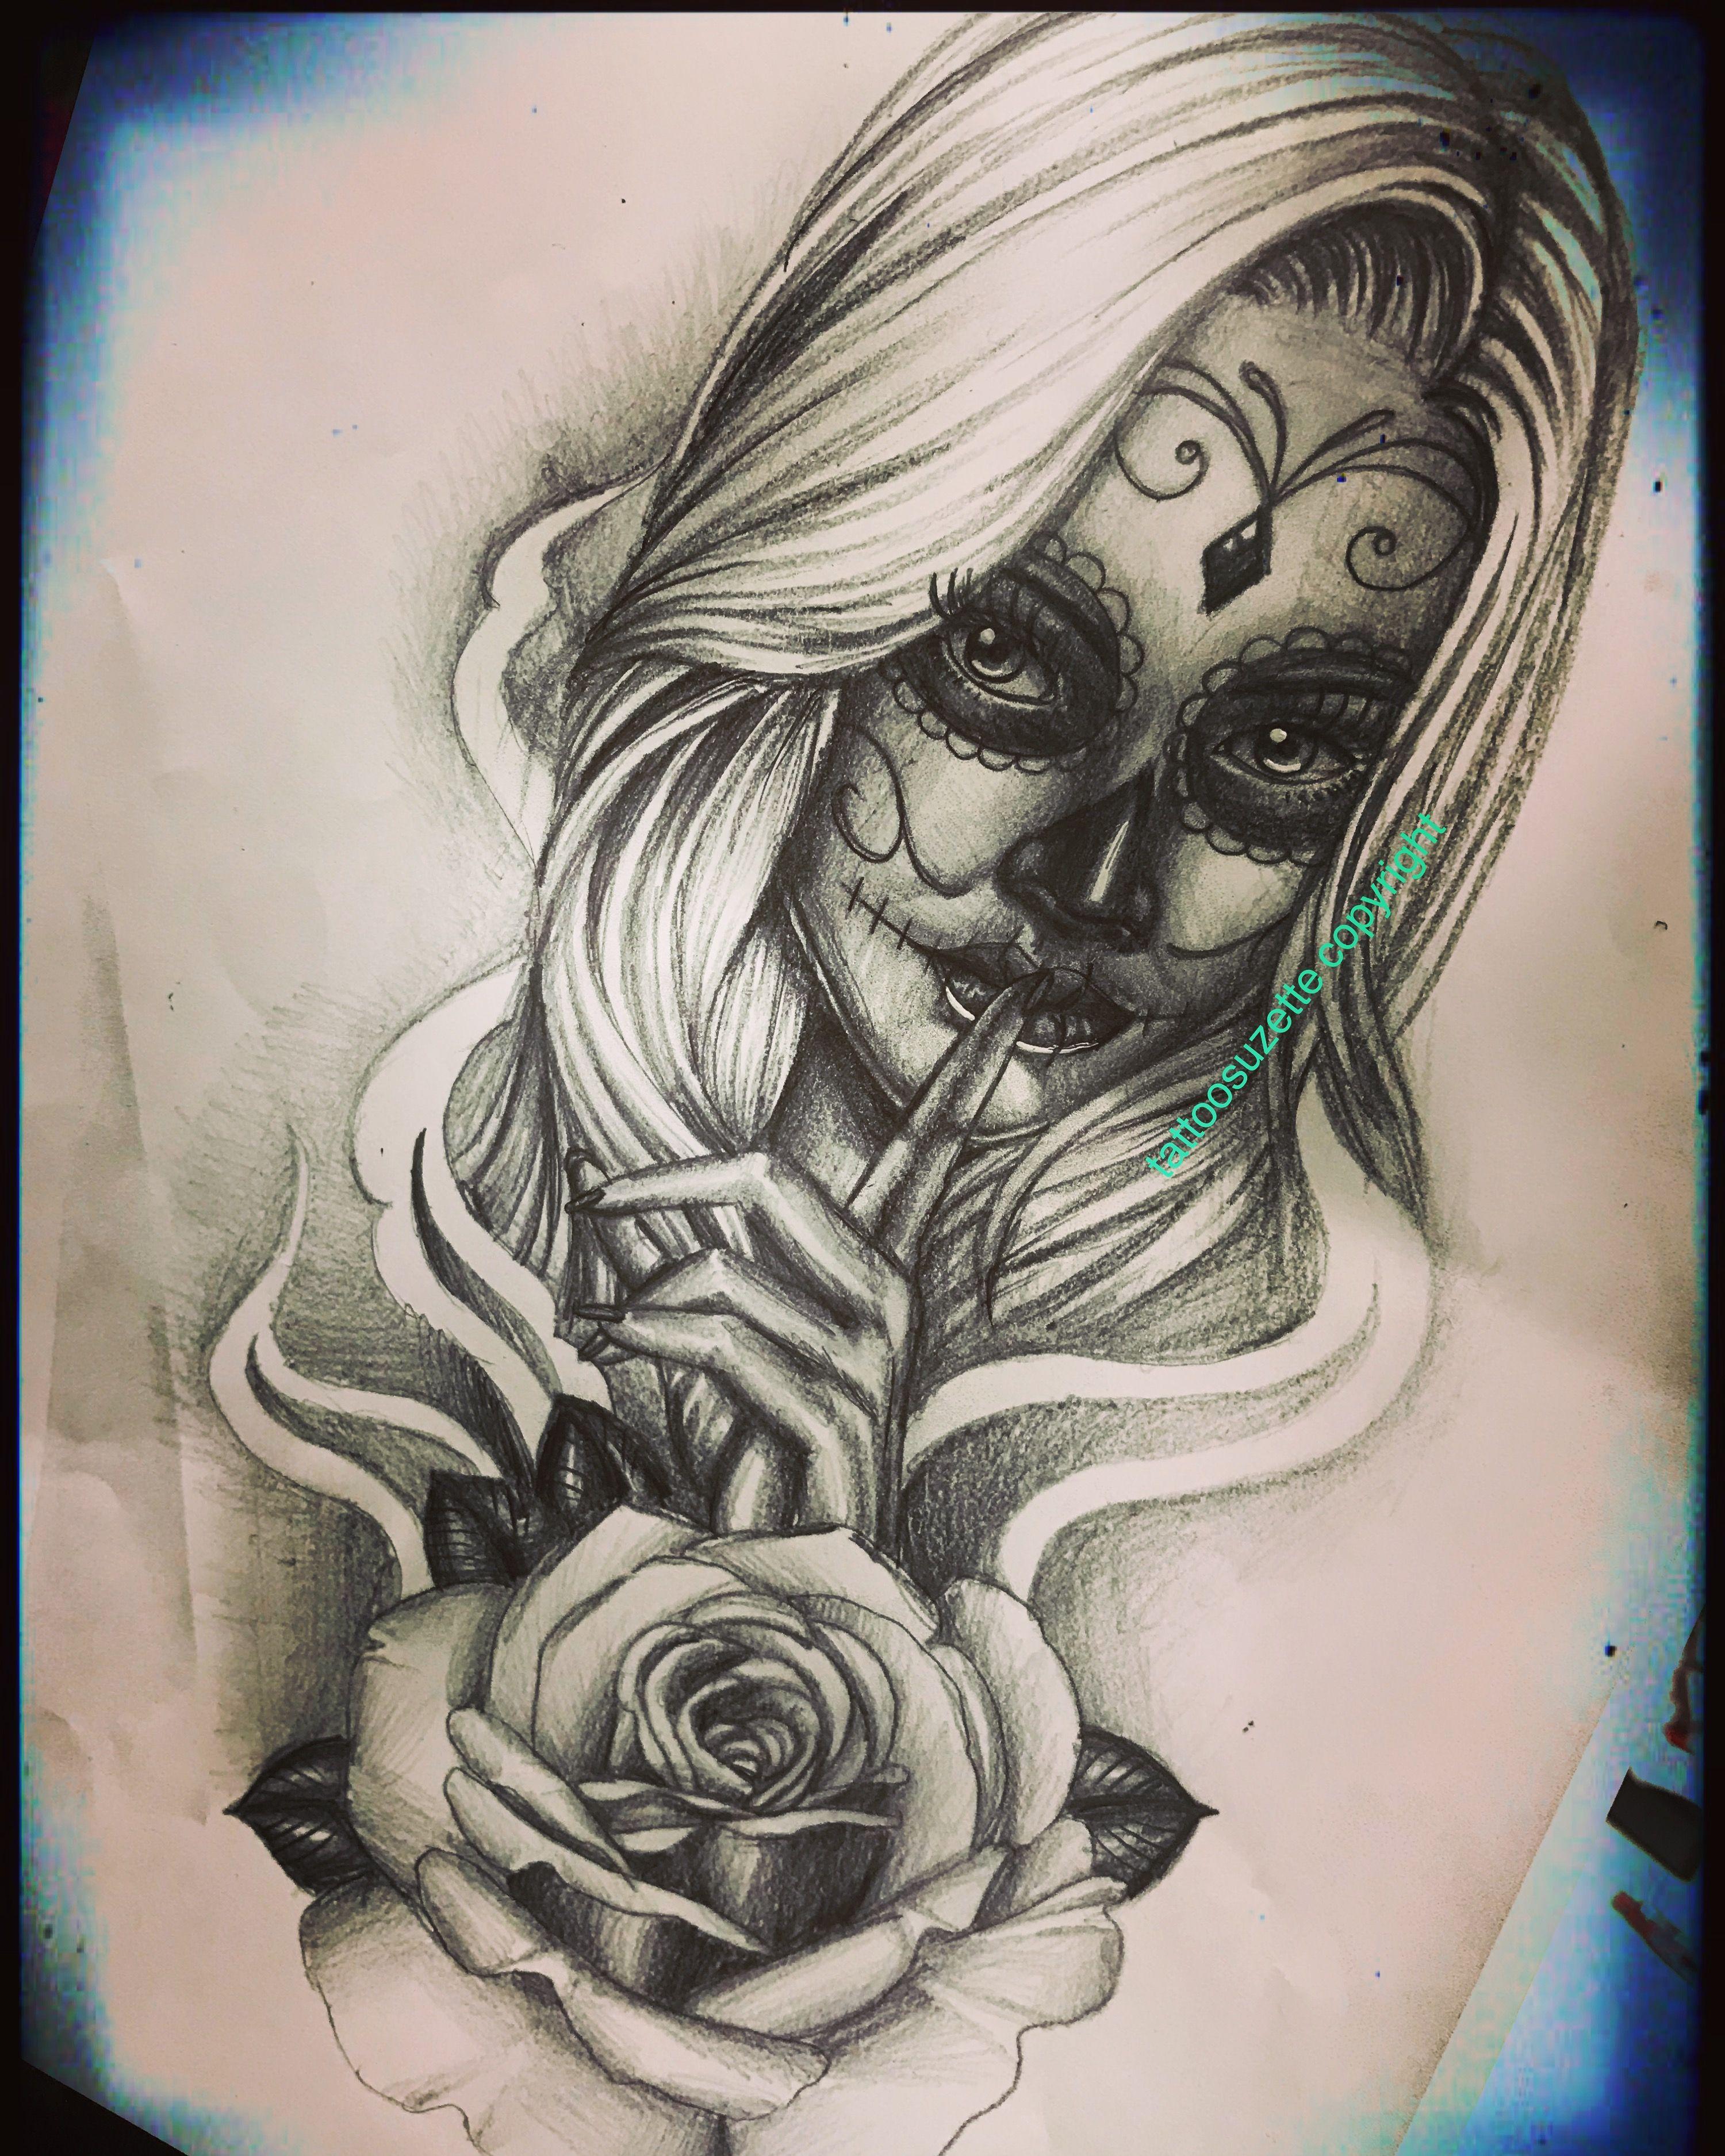 Santa muerte tattoo tattoo tattoodesign tatouage catrina katrina santamuerte - Santa muerte tatouage signification ...